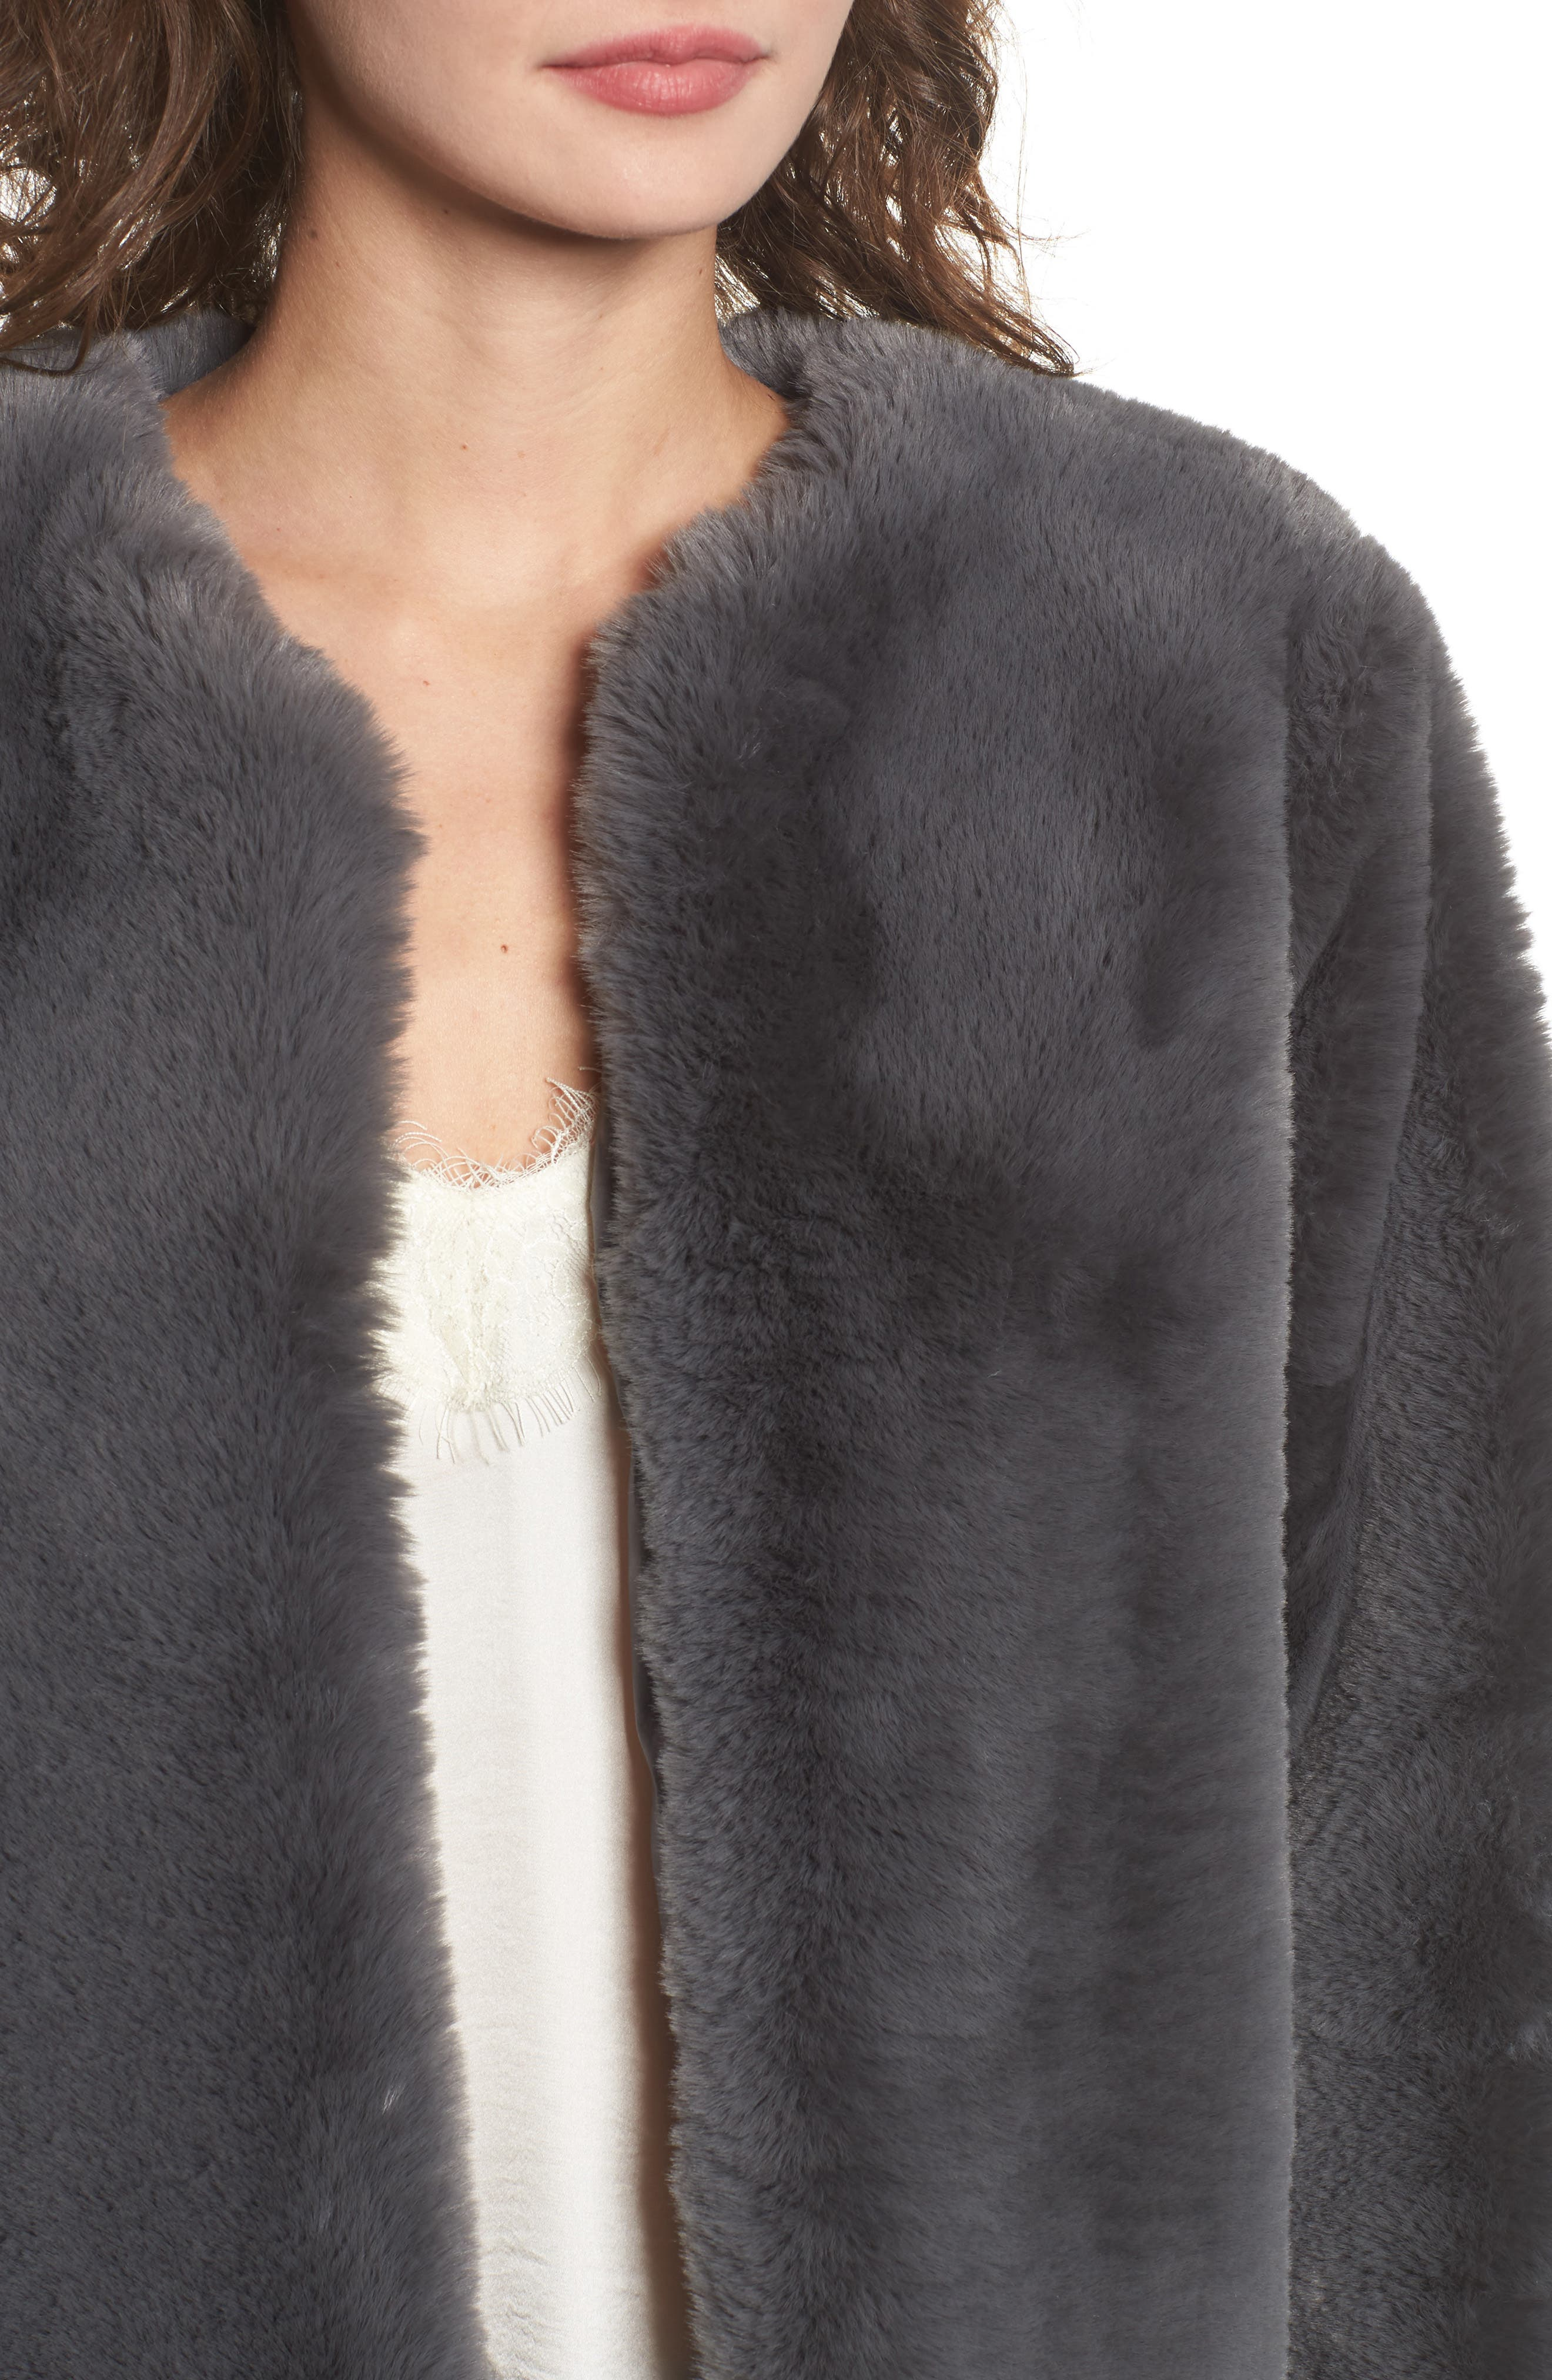 Faux Fur Jacket,                             Alternate thumbnail 4, color,                             Smoke